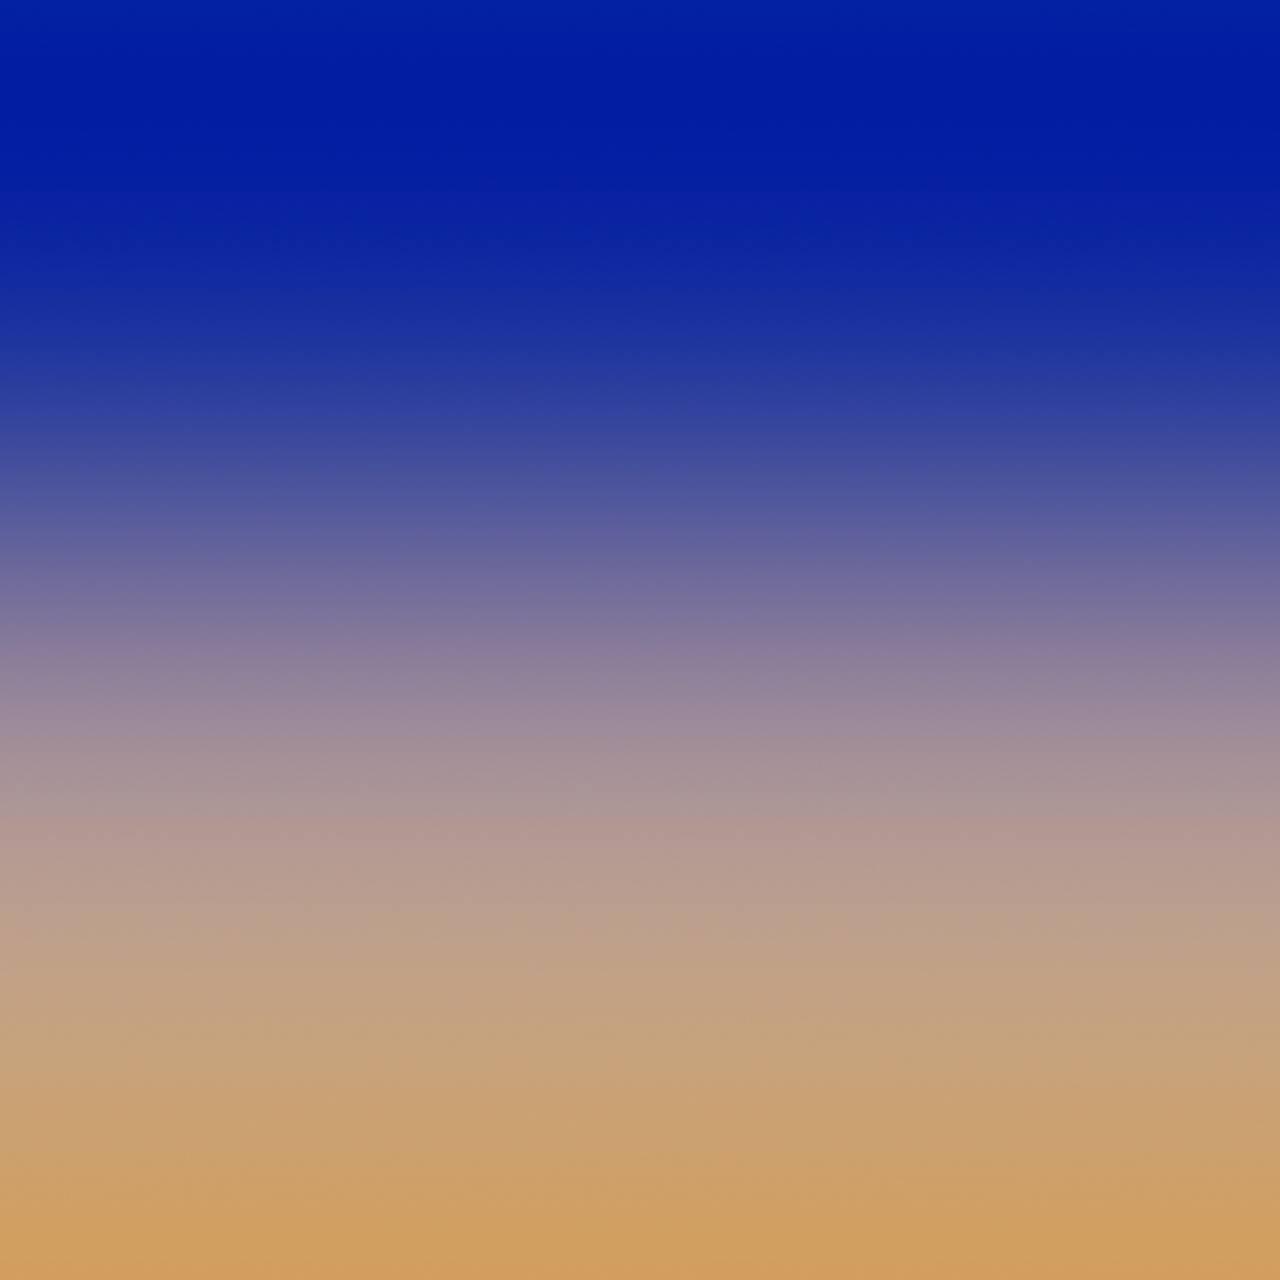 Galaxy Note 9 Wallpaper By Krystian4584 3a Free On Zedge